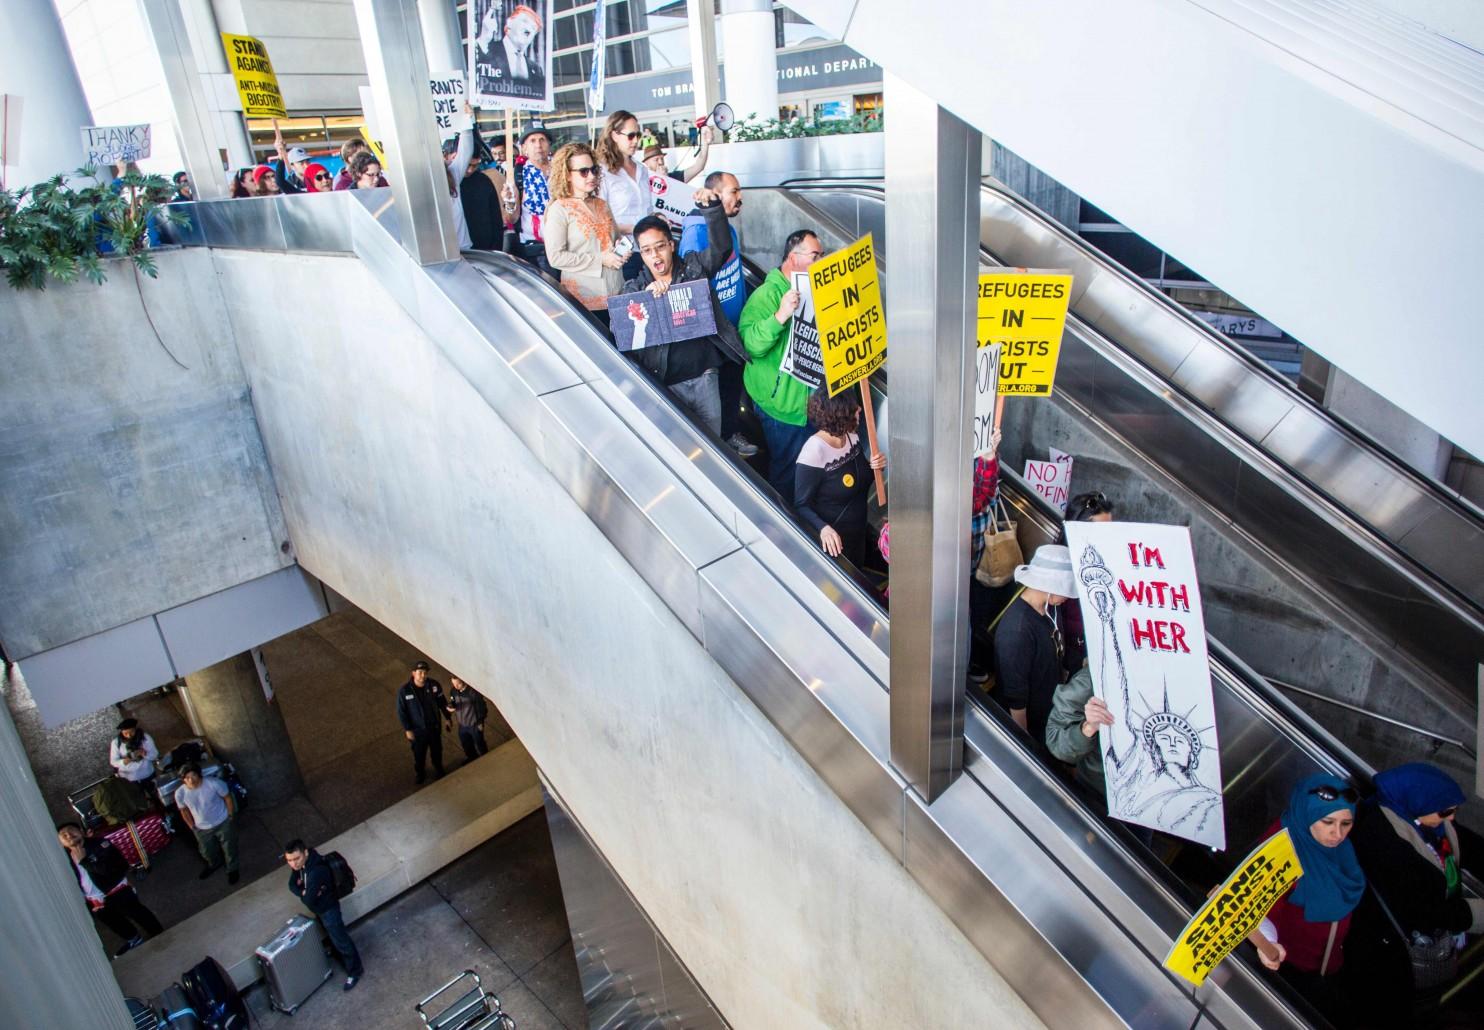 Virginia federal judge issues rebuke of Trump's travel ban